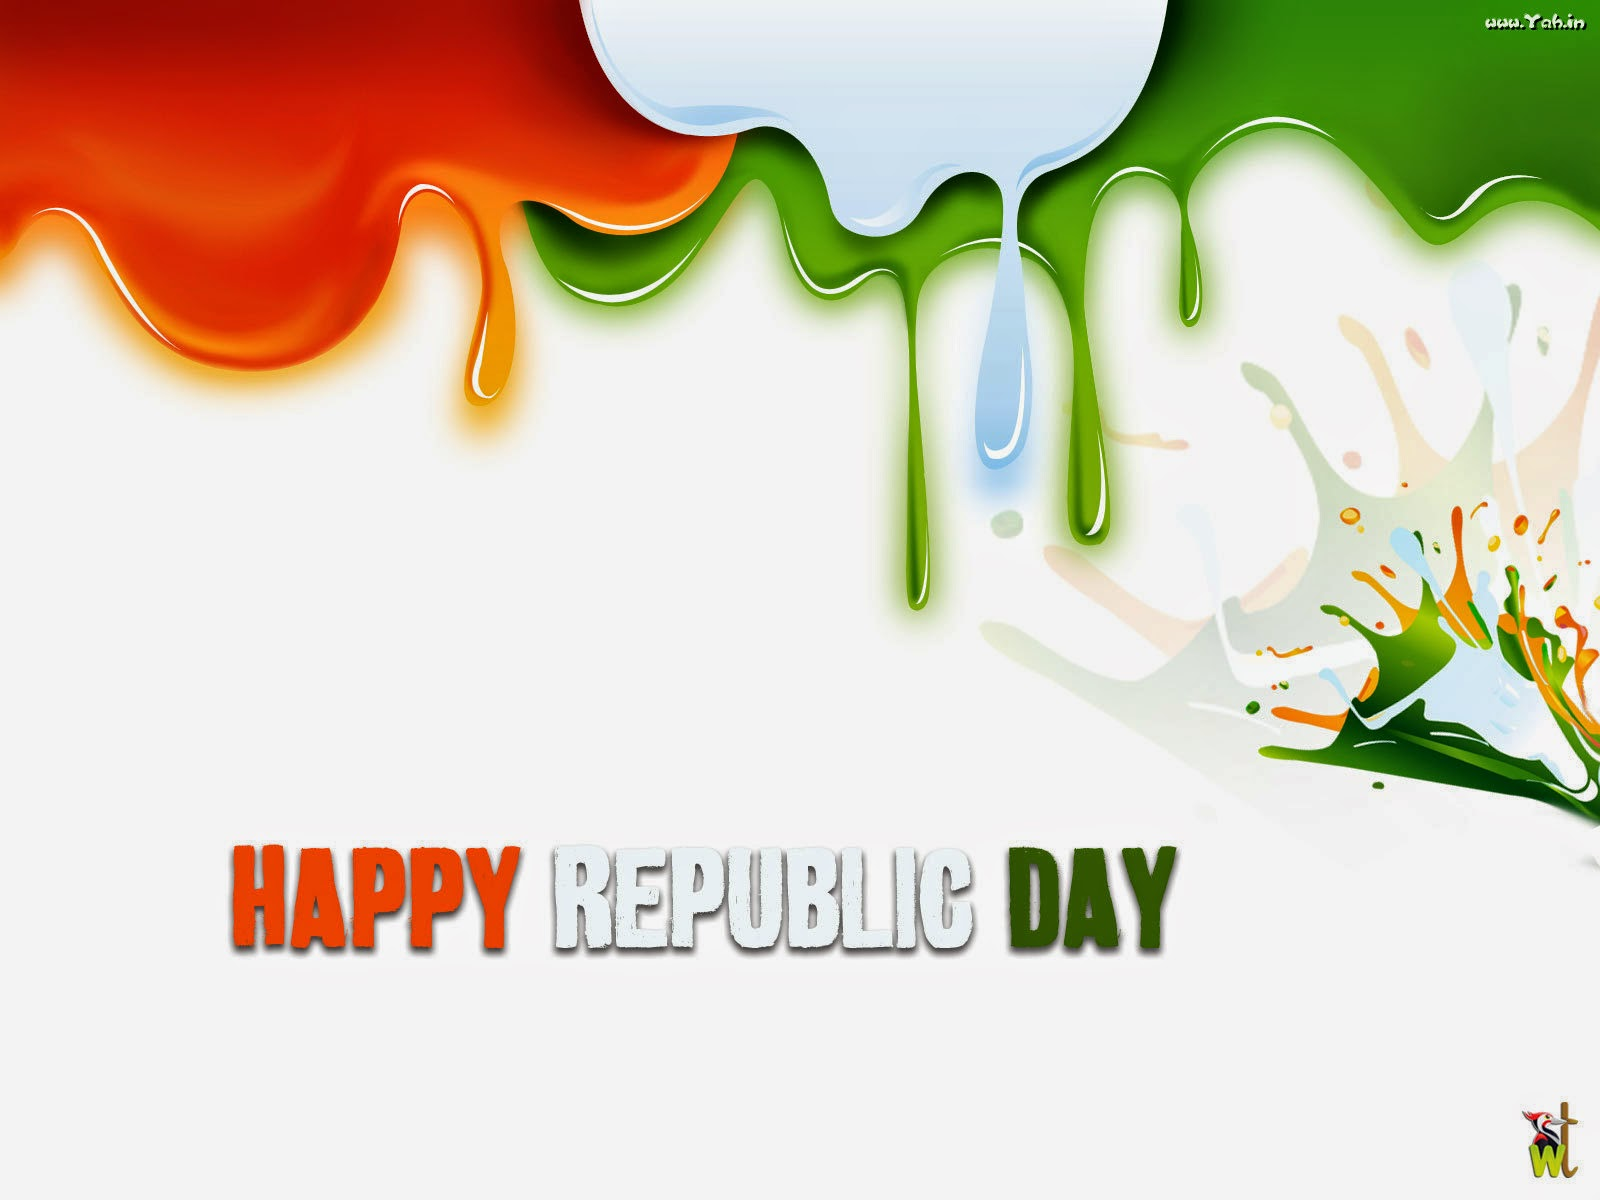 republic day images india